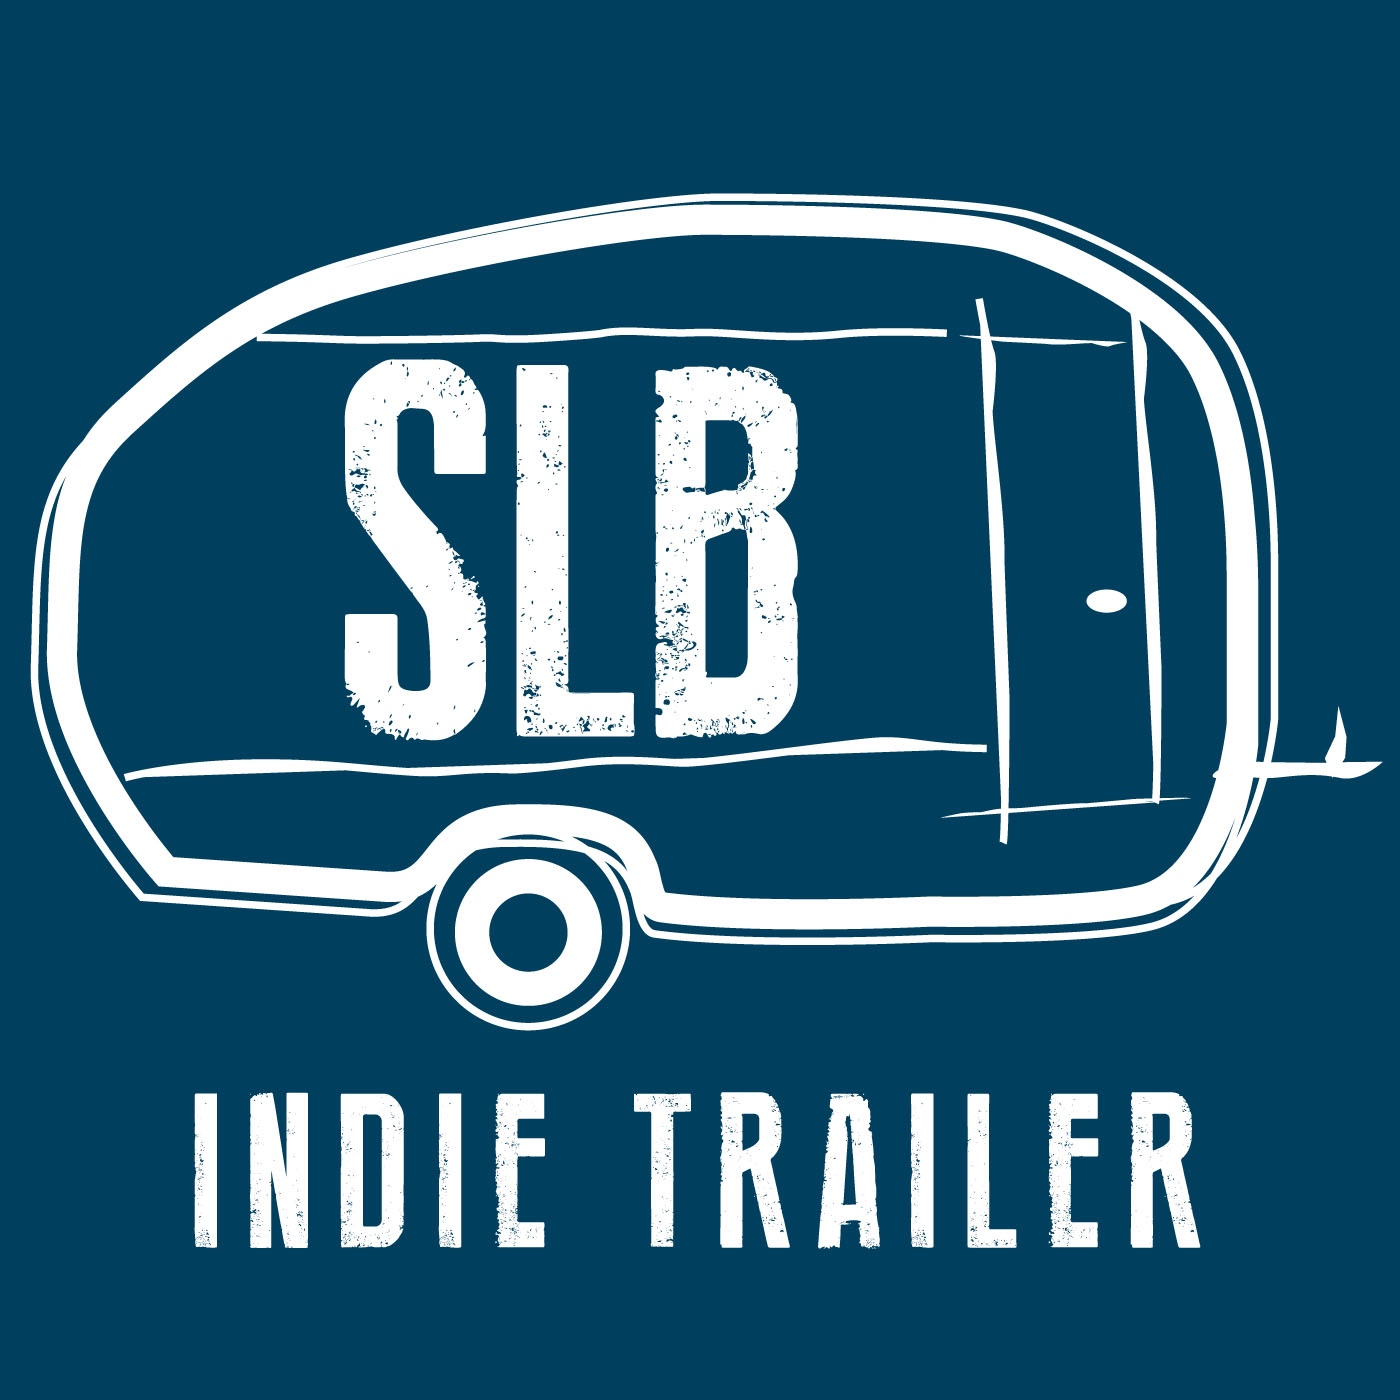 SLB Indie Trailer show art